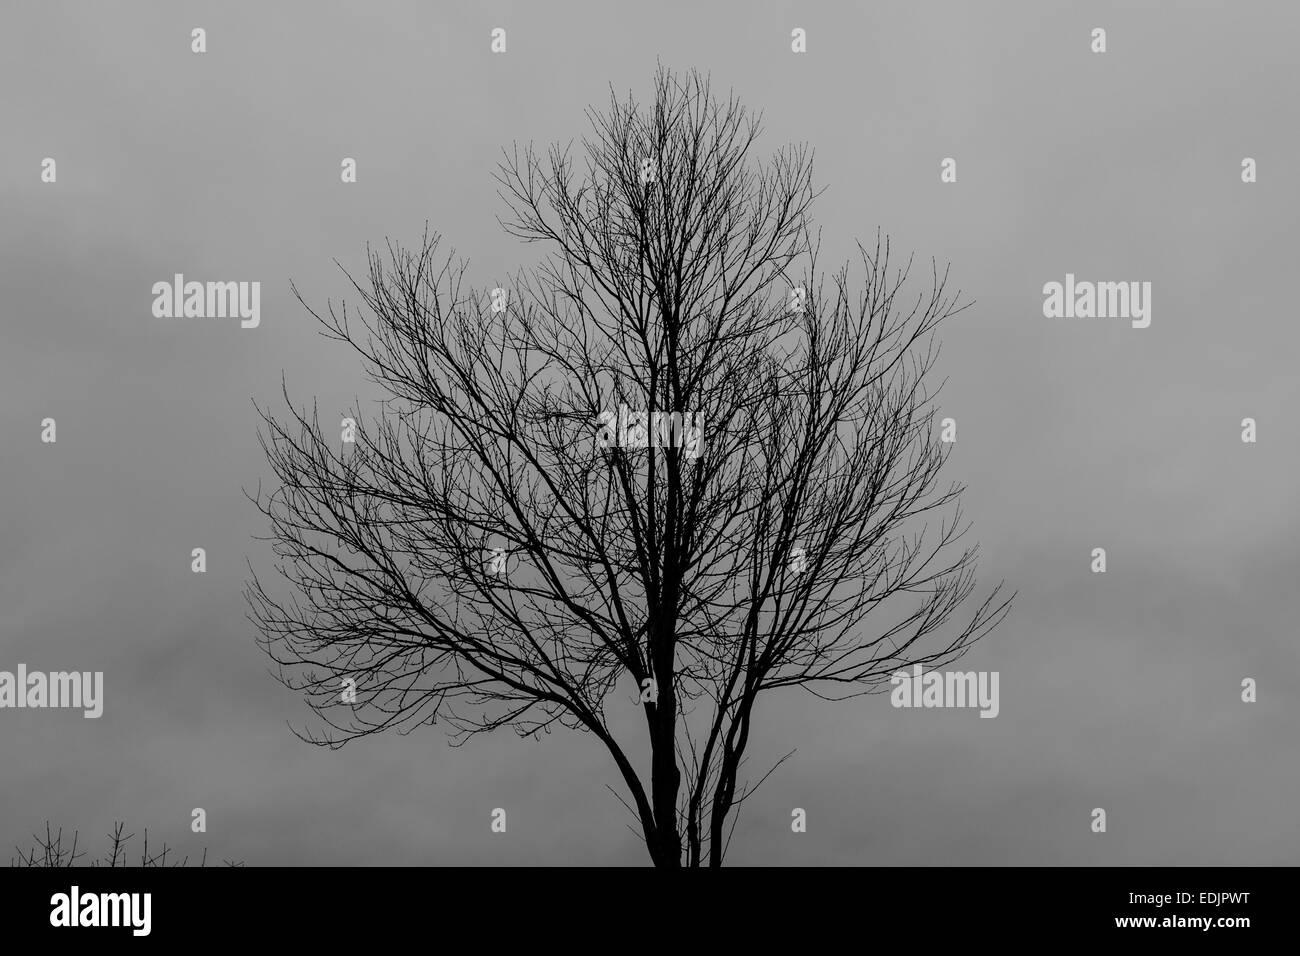 Bare tree against a overcast gloomy sky - Stock Image